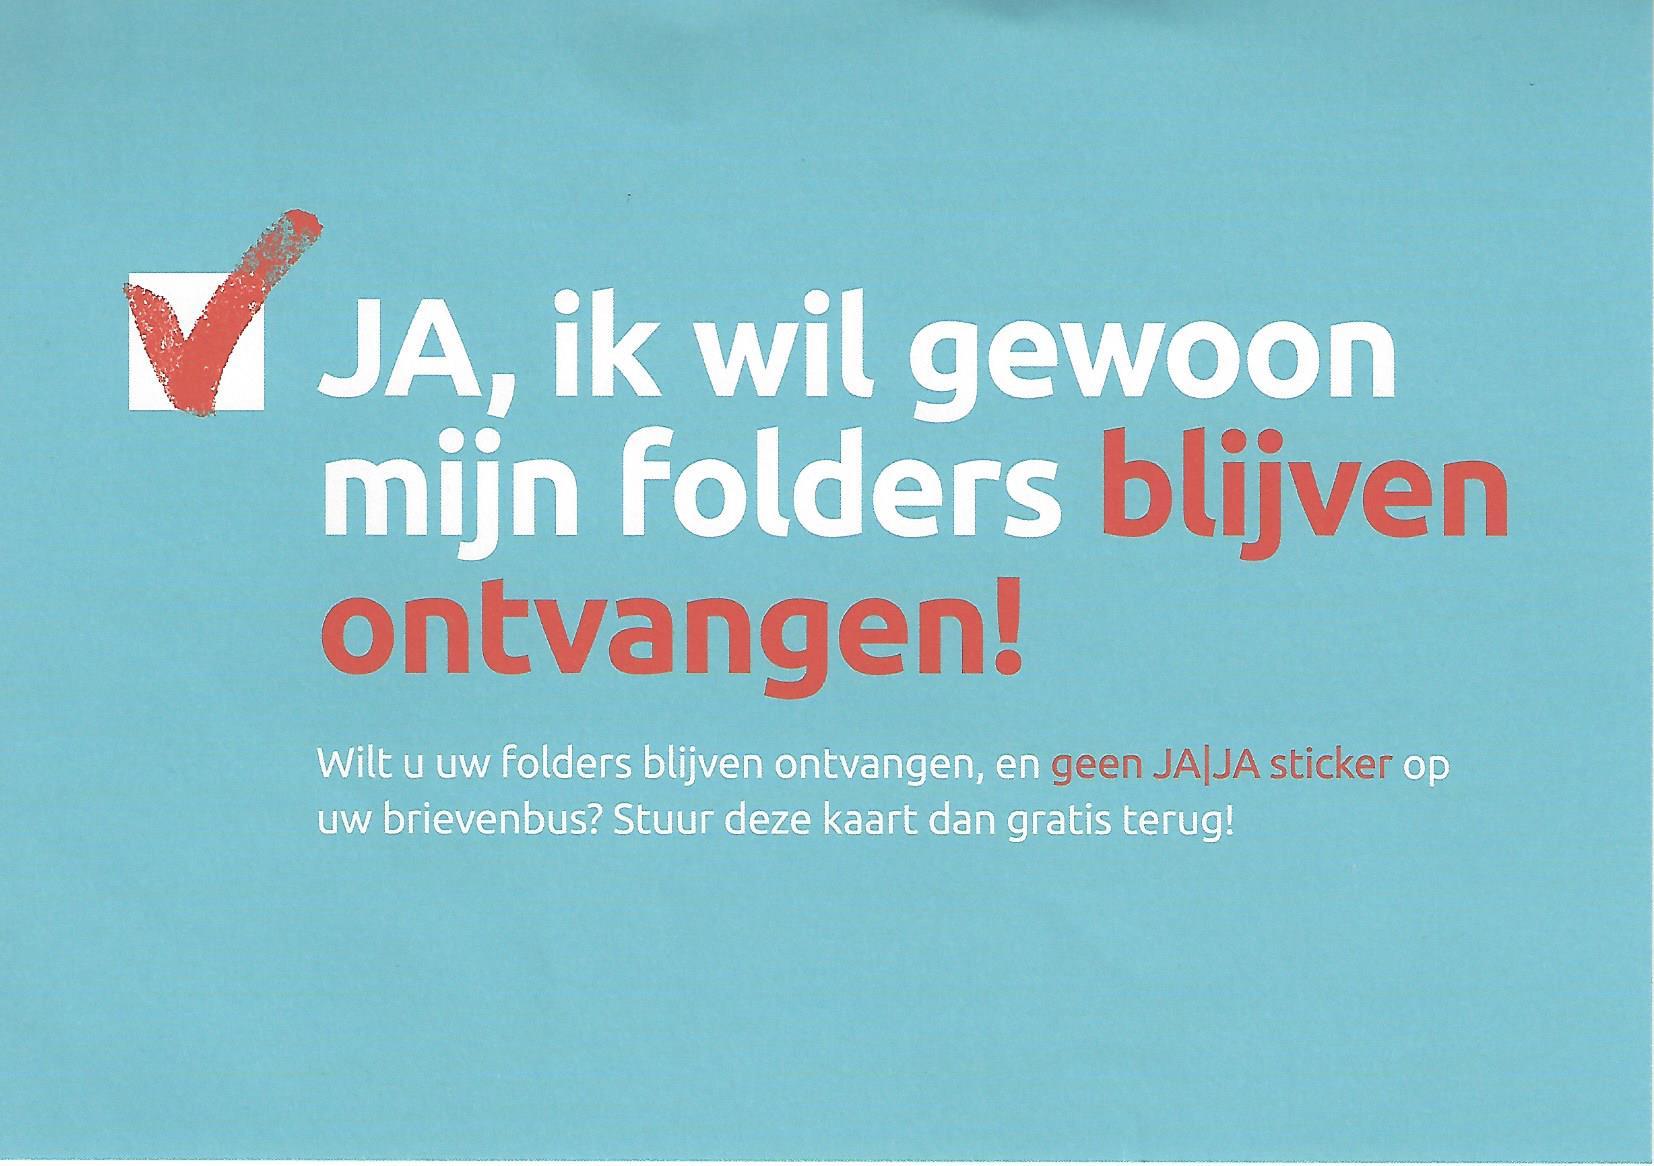 ja-ik-wil-hah-spam1